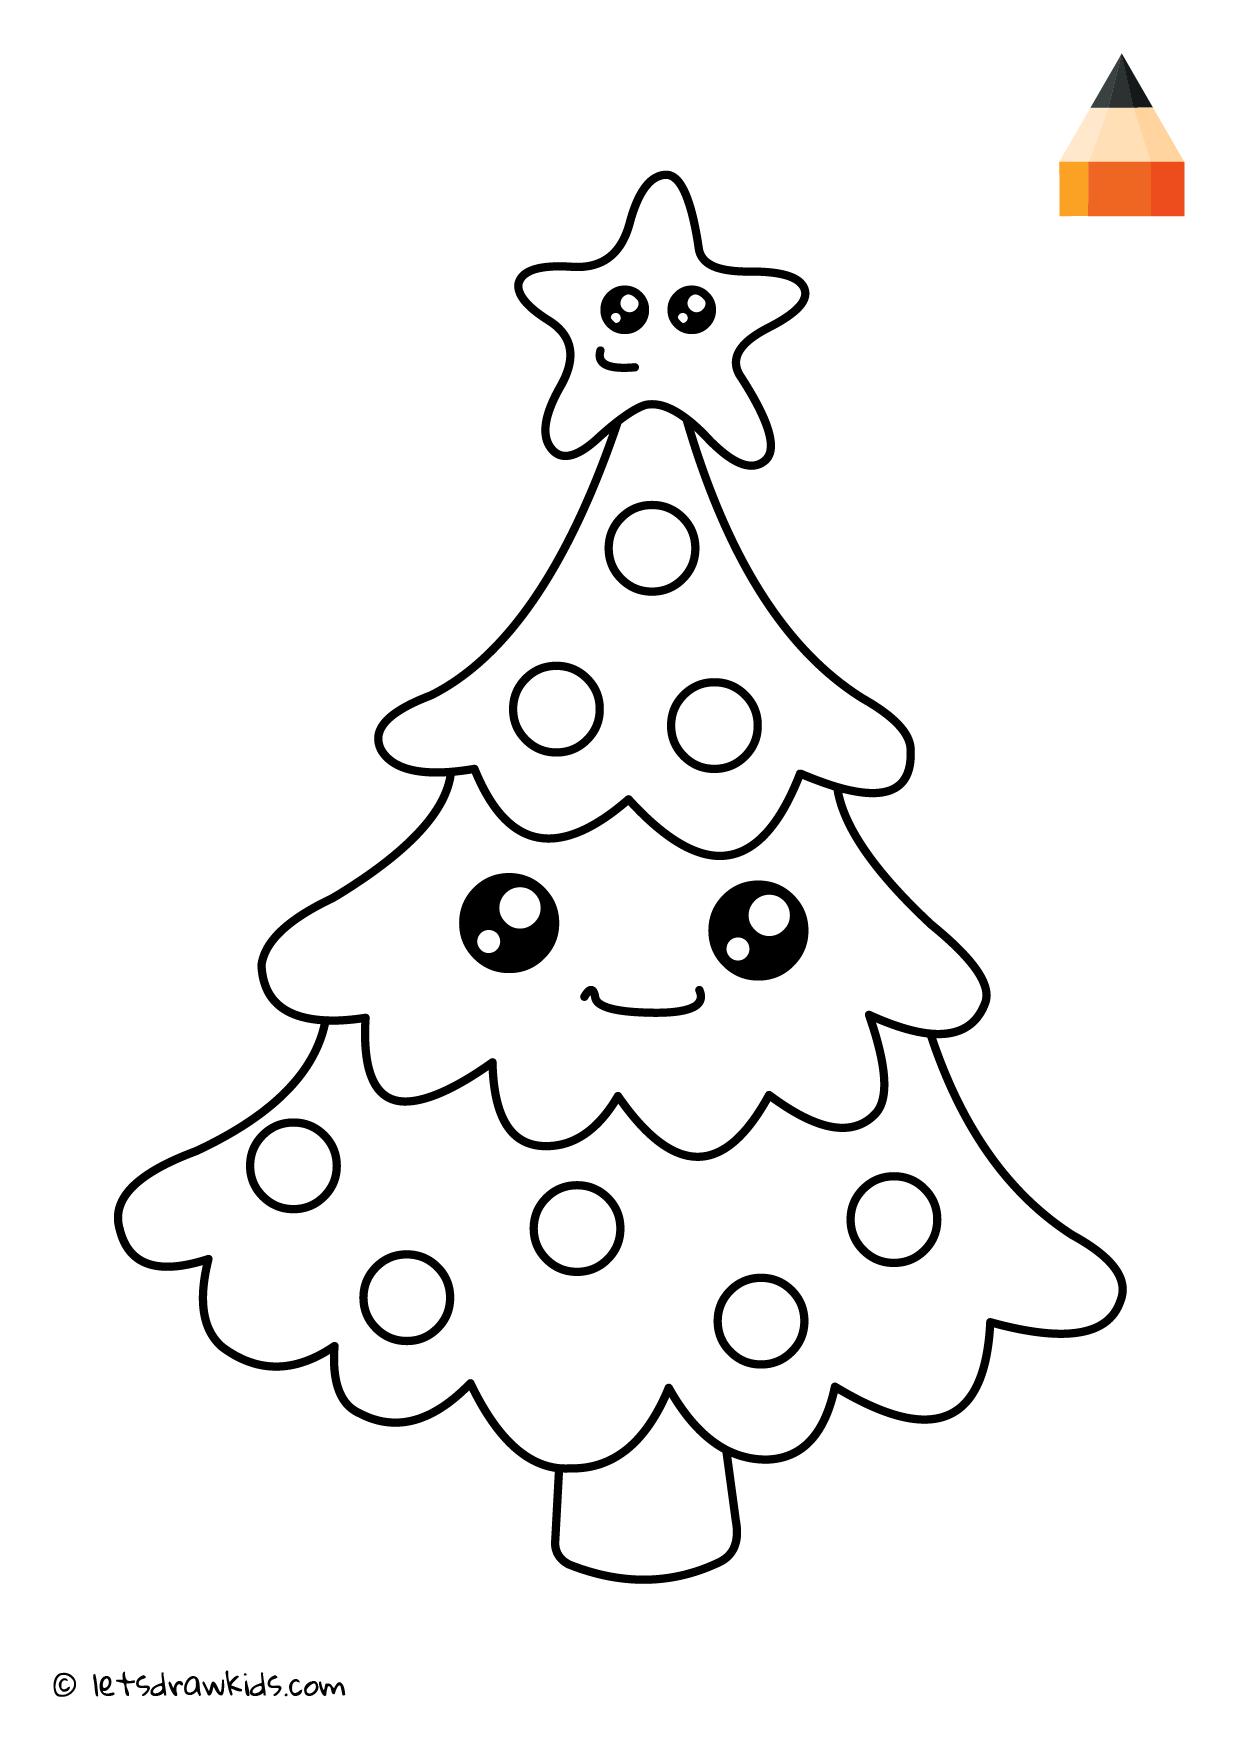 Coloring Page Christmas Tree Christmas Tree Drawing Drawings Christmas Trees For Kids